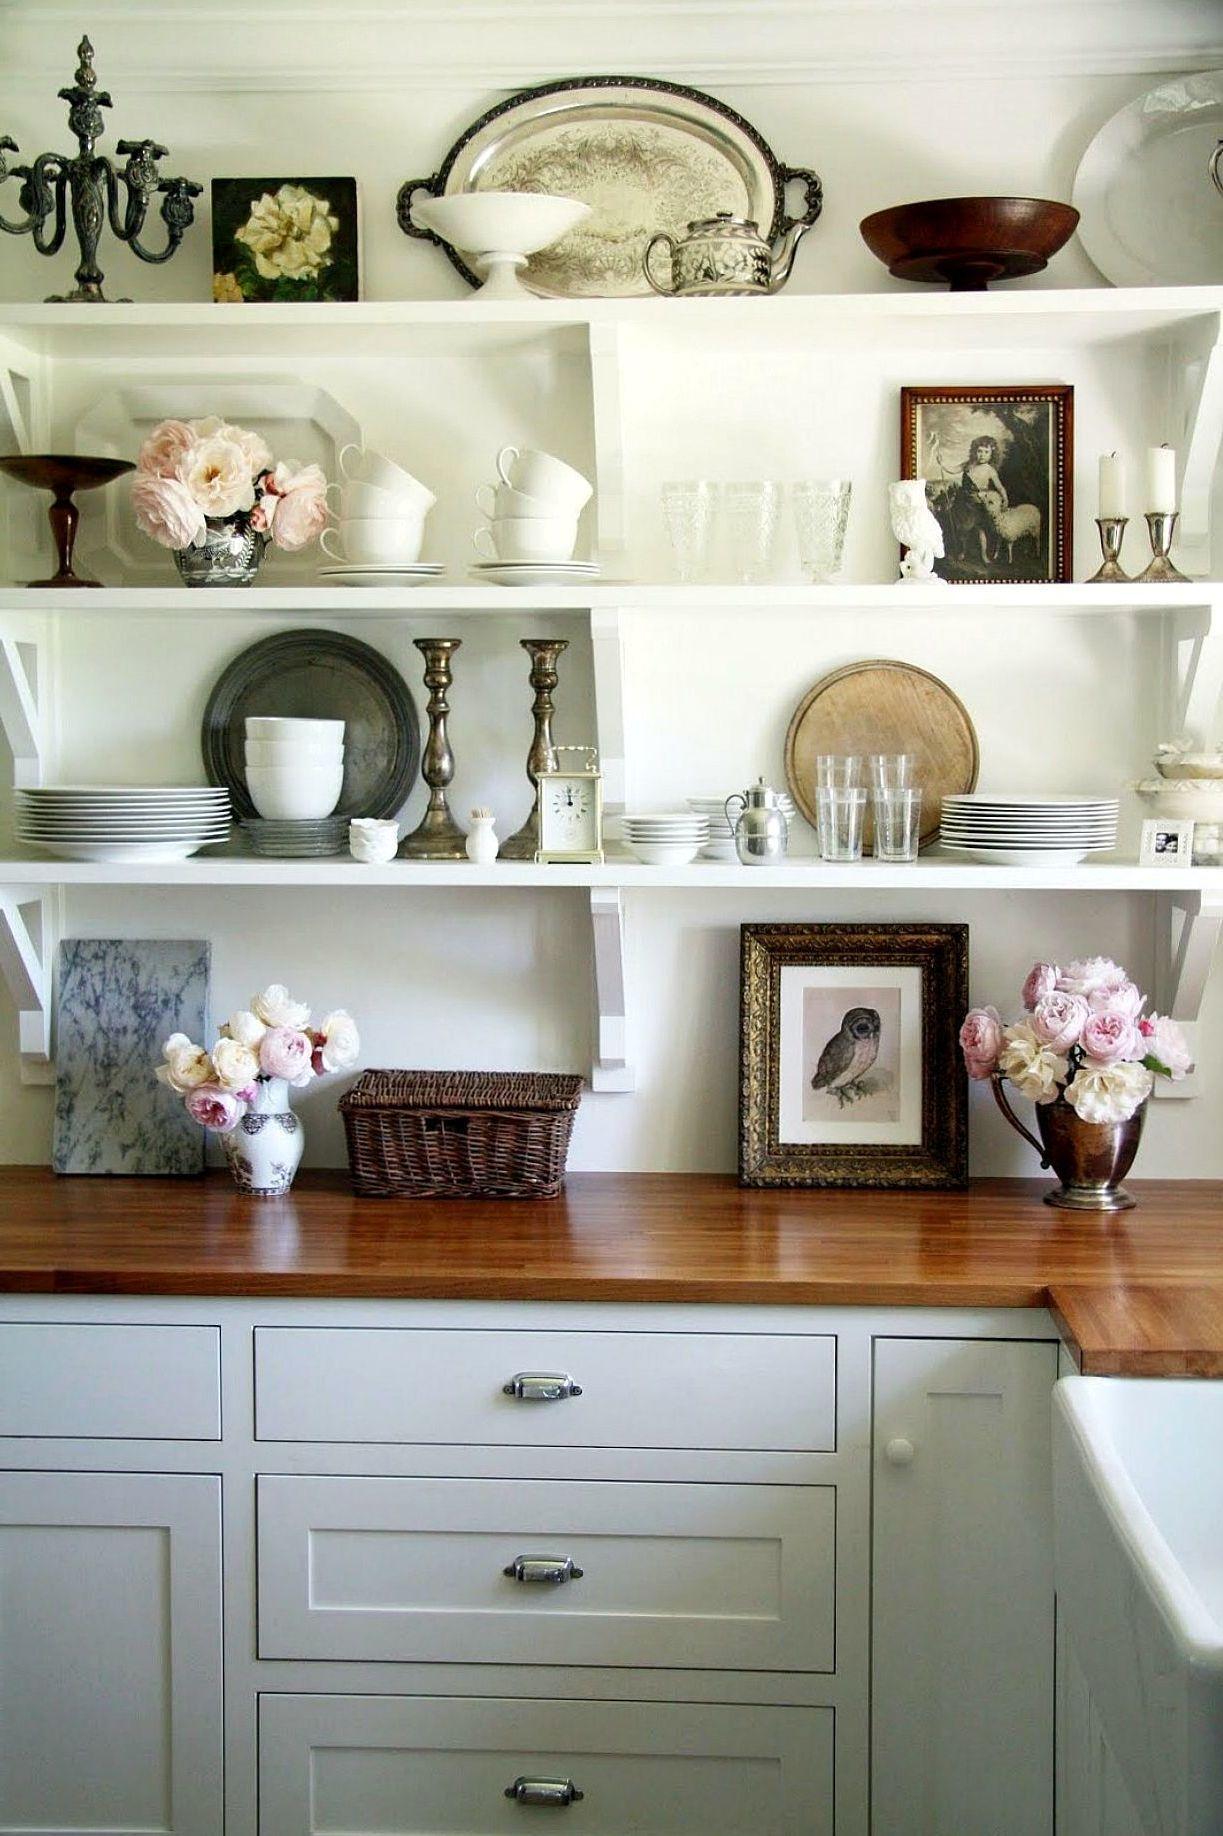 open shelving kitchen design ideas  kitchen remodel